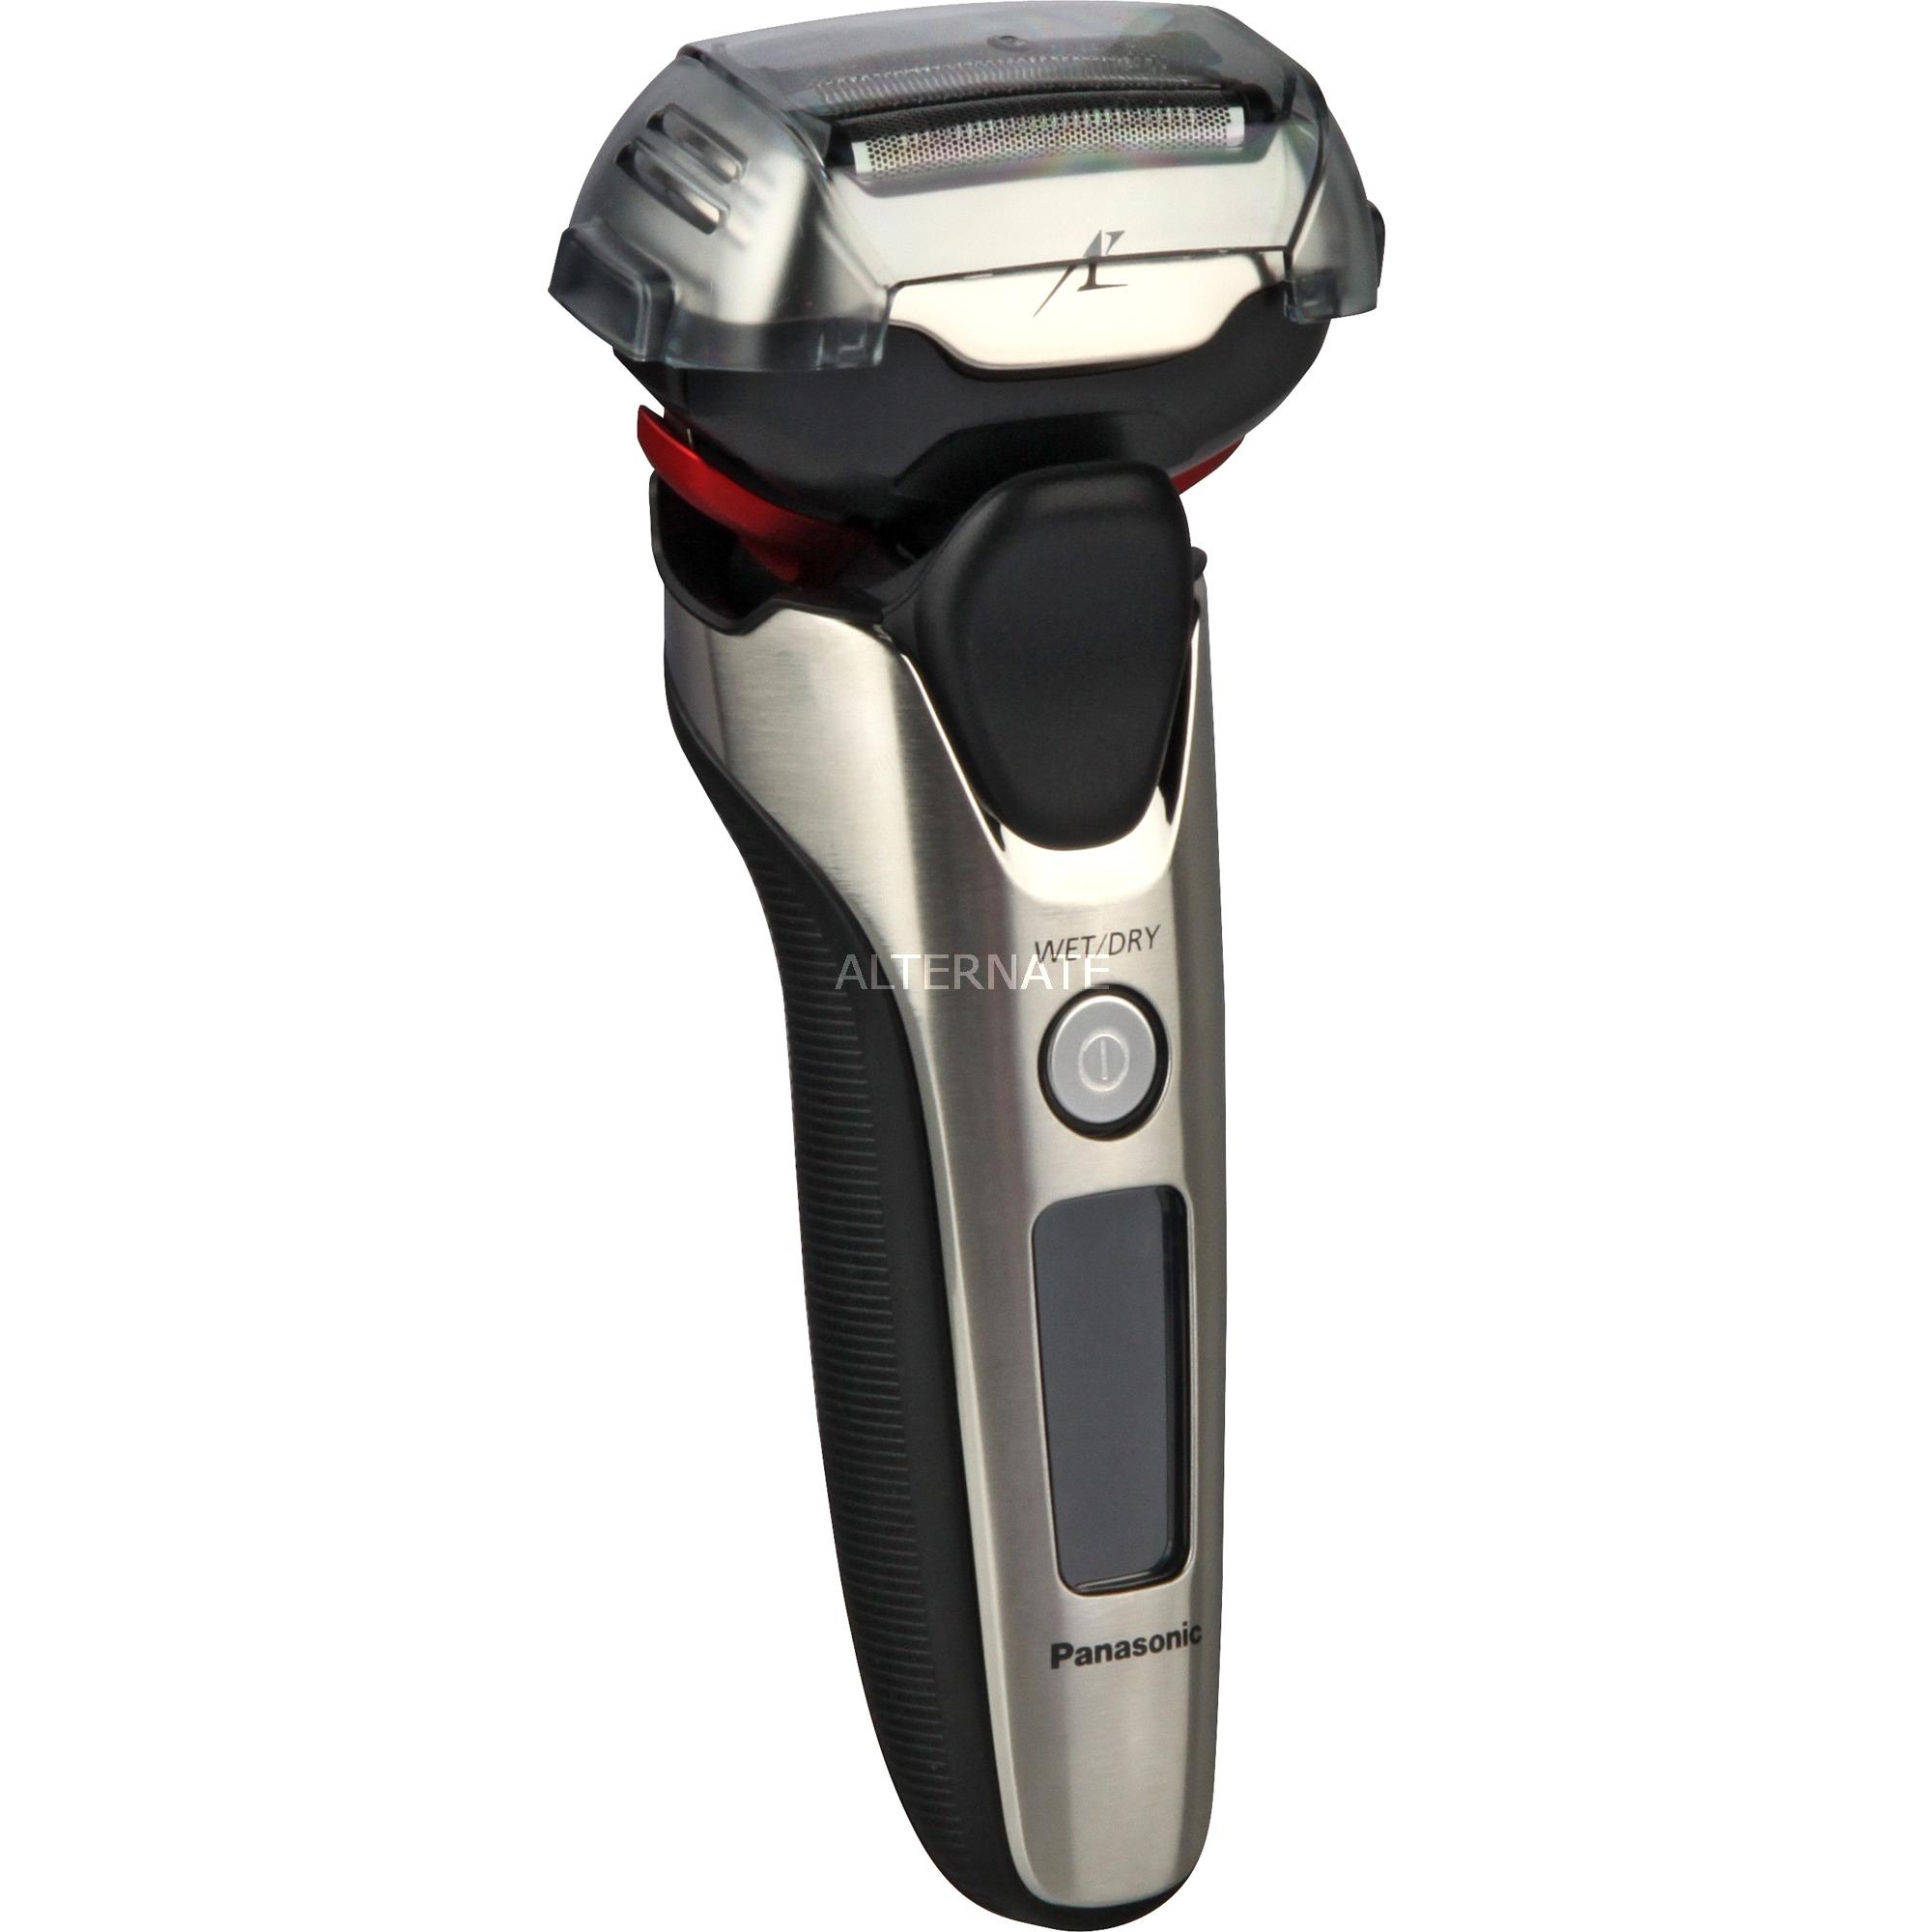 ES-LT4N Máquina de afeitar de láminas Negro, Acero inoxidable